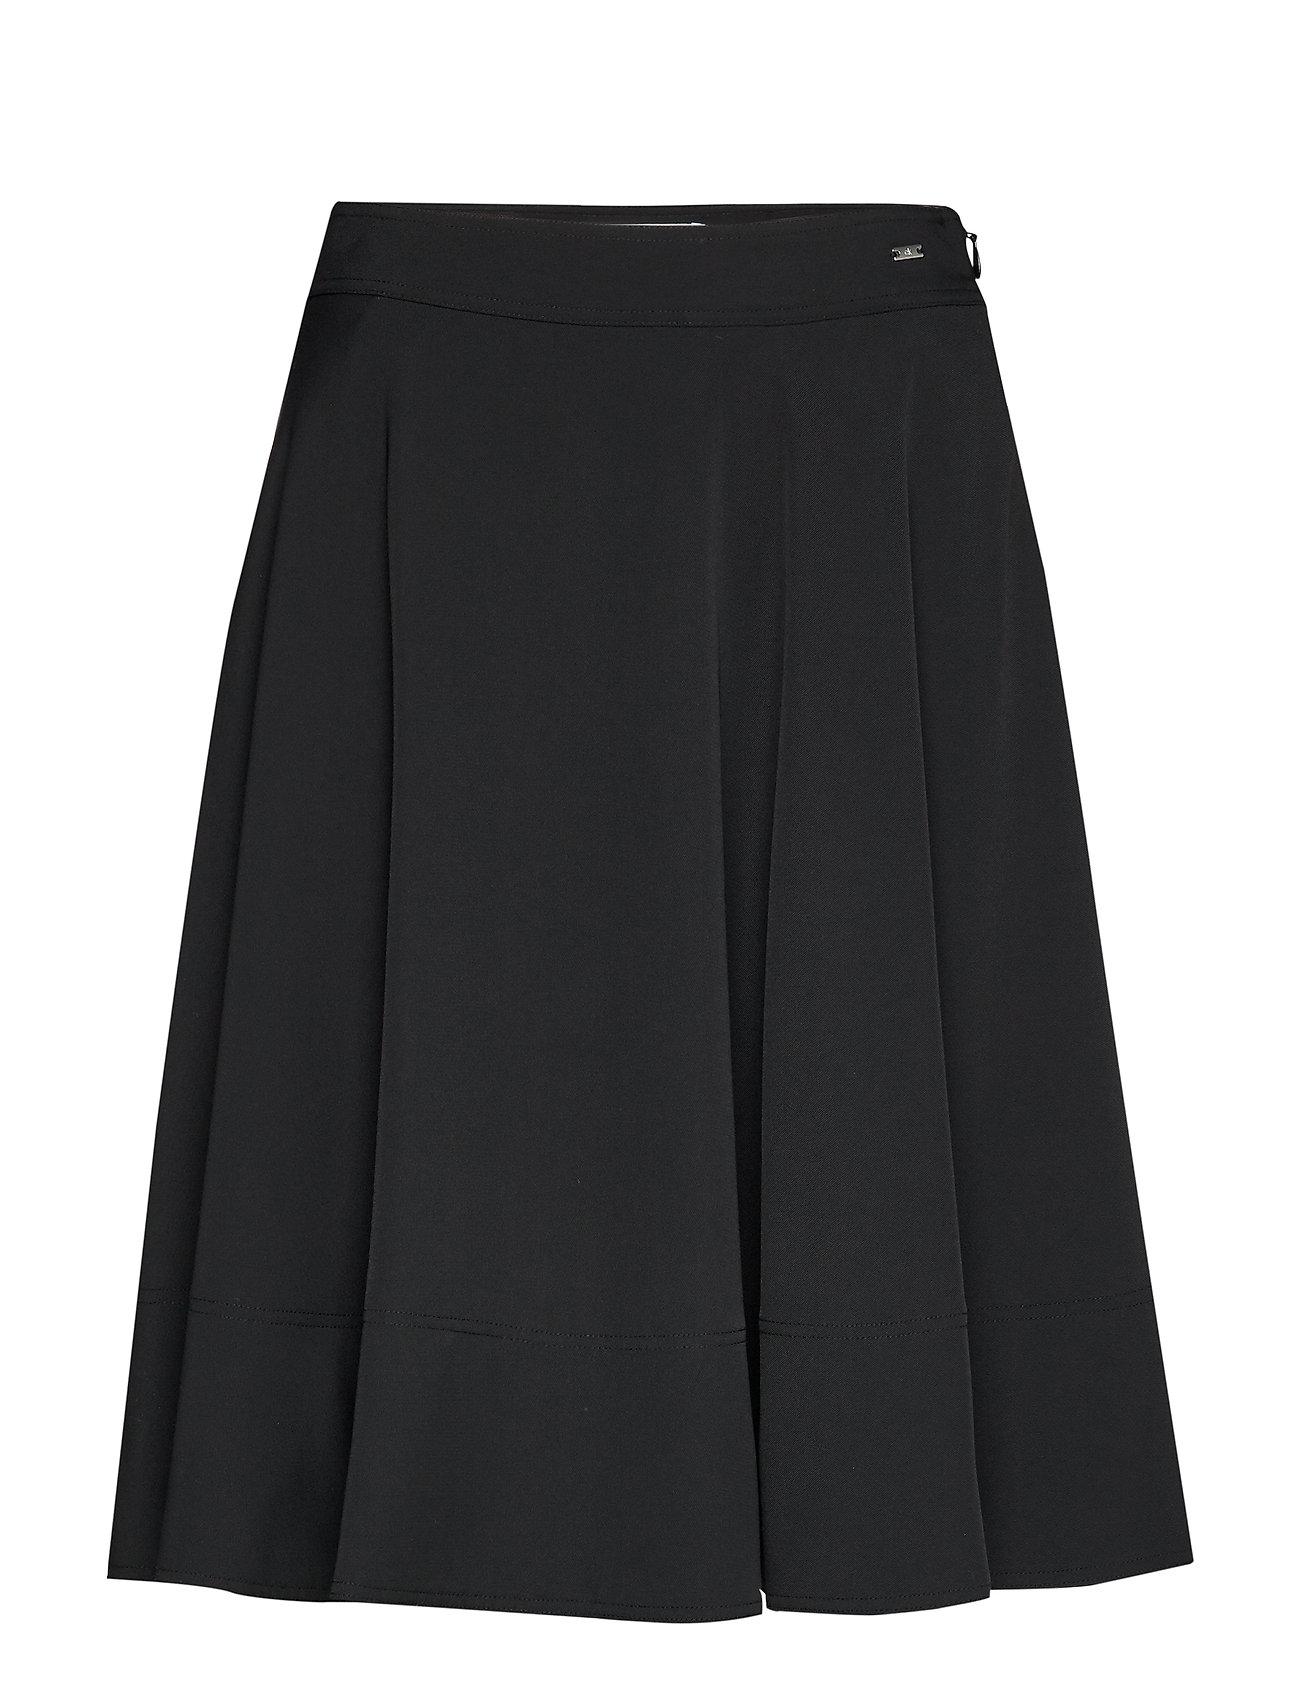 Calvin Klein SMOOTH TWILL HALF CIRCLE SKIRT - CALVIN BLACK